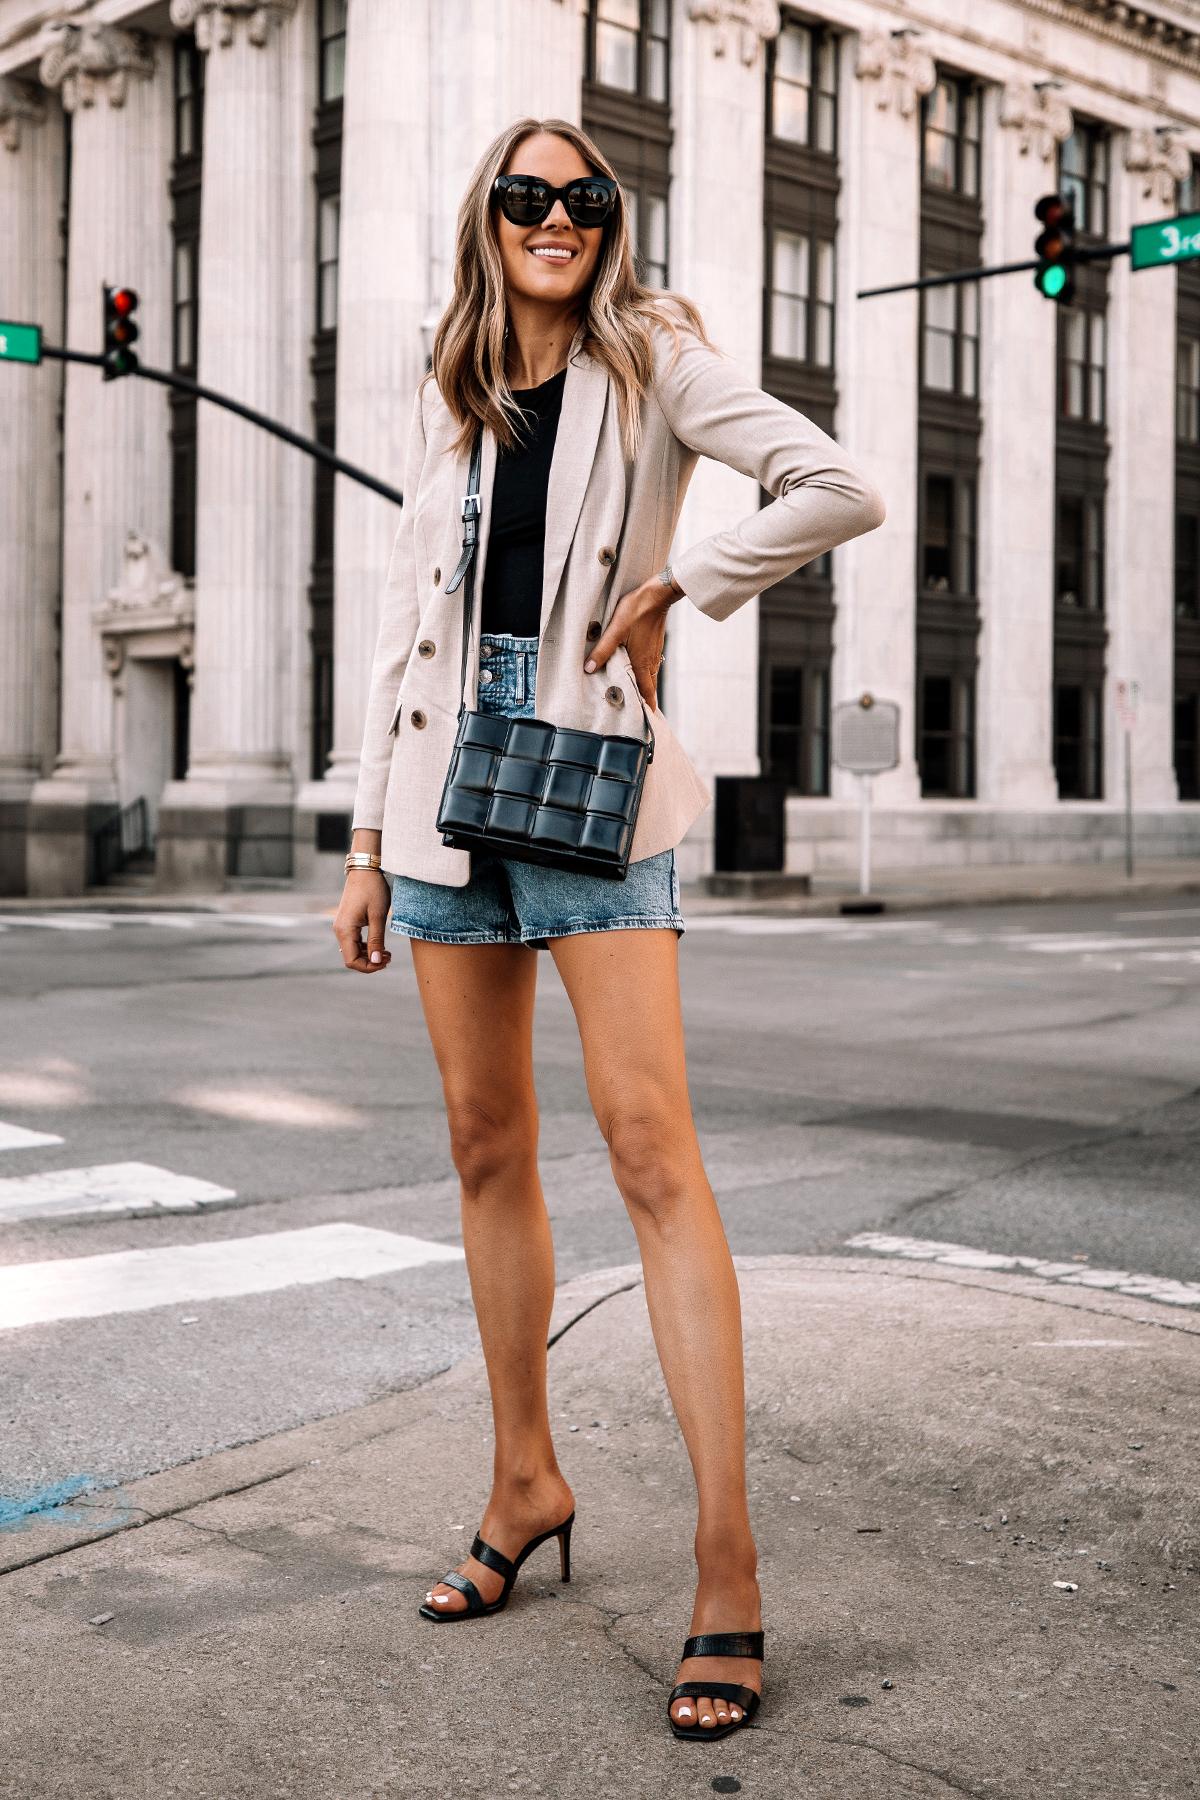 Fashion Jackson Wearing Beige Blazer Denim Shorts Black Heels Street Style Spring Outfit